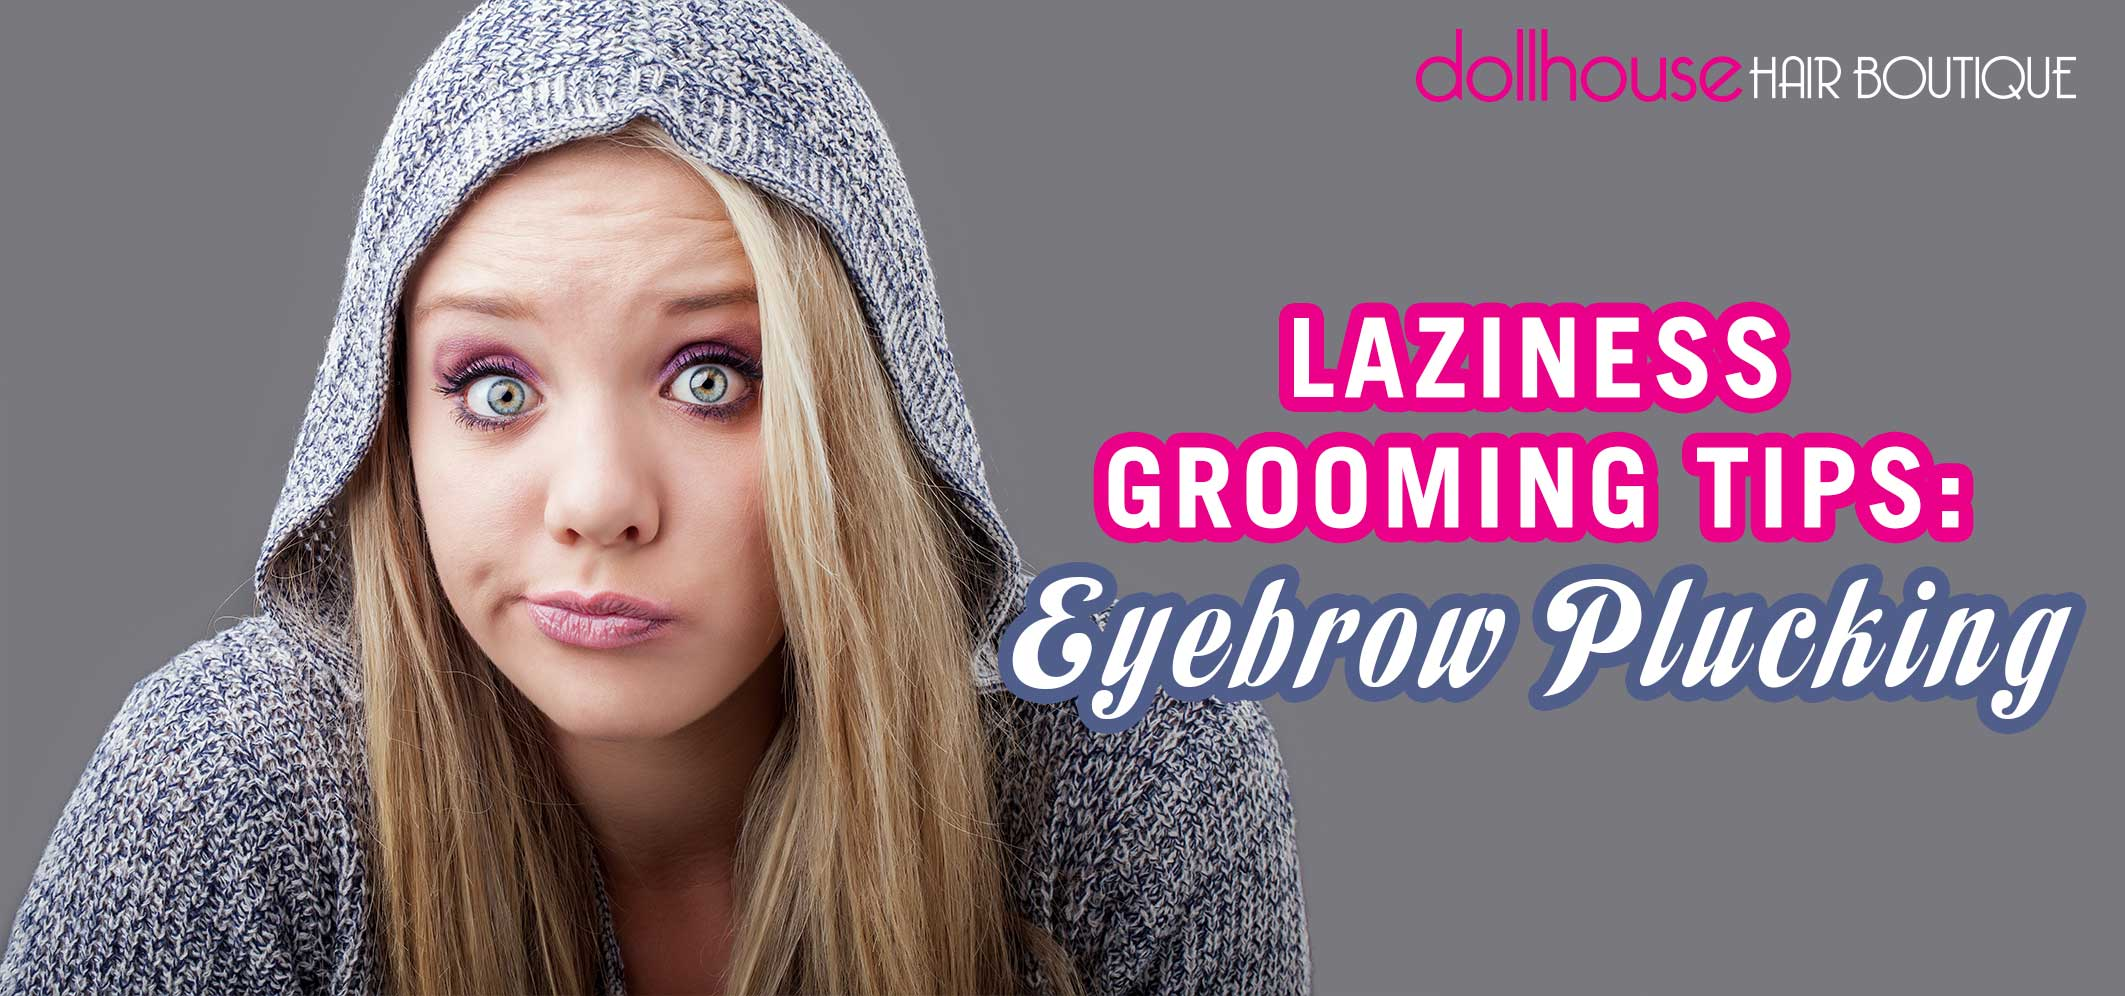 Laziness-Grooming-Tips-Eyebrow-Plucking